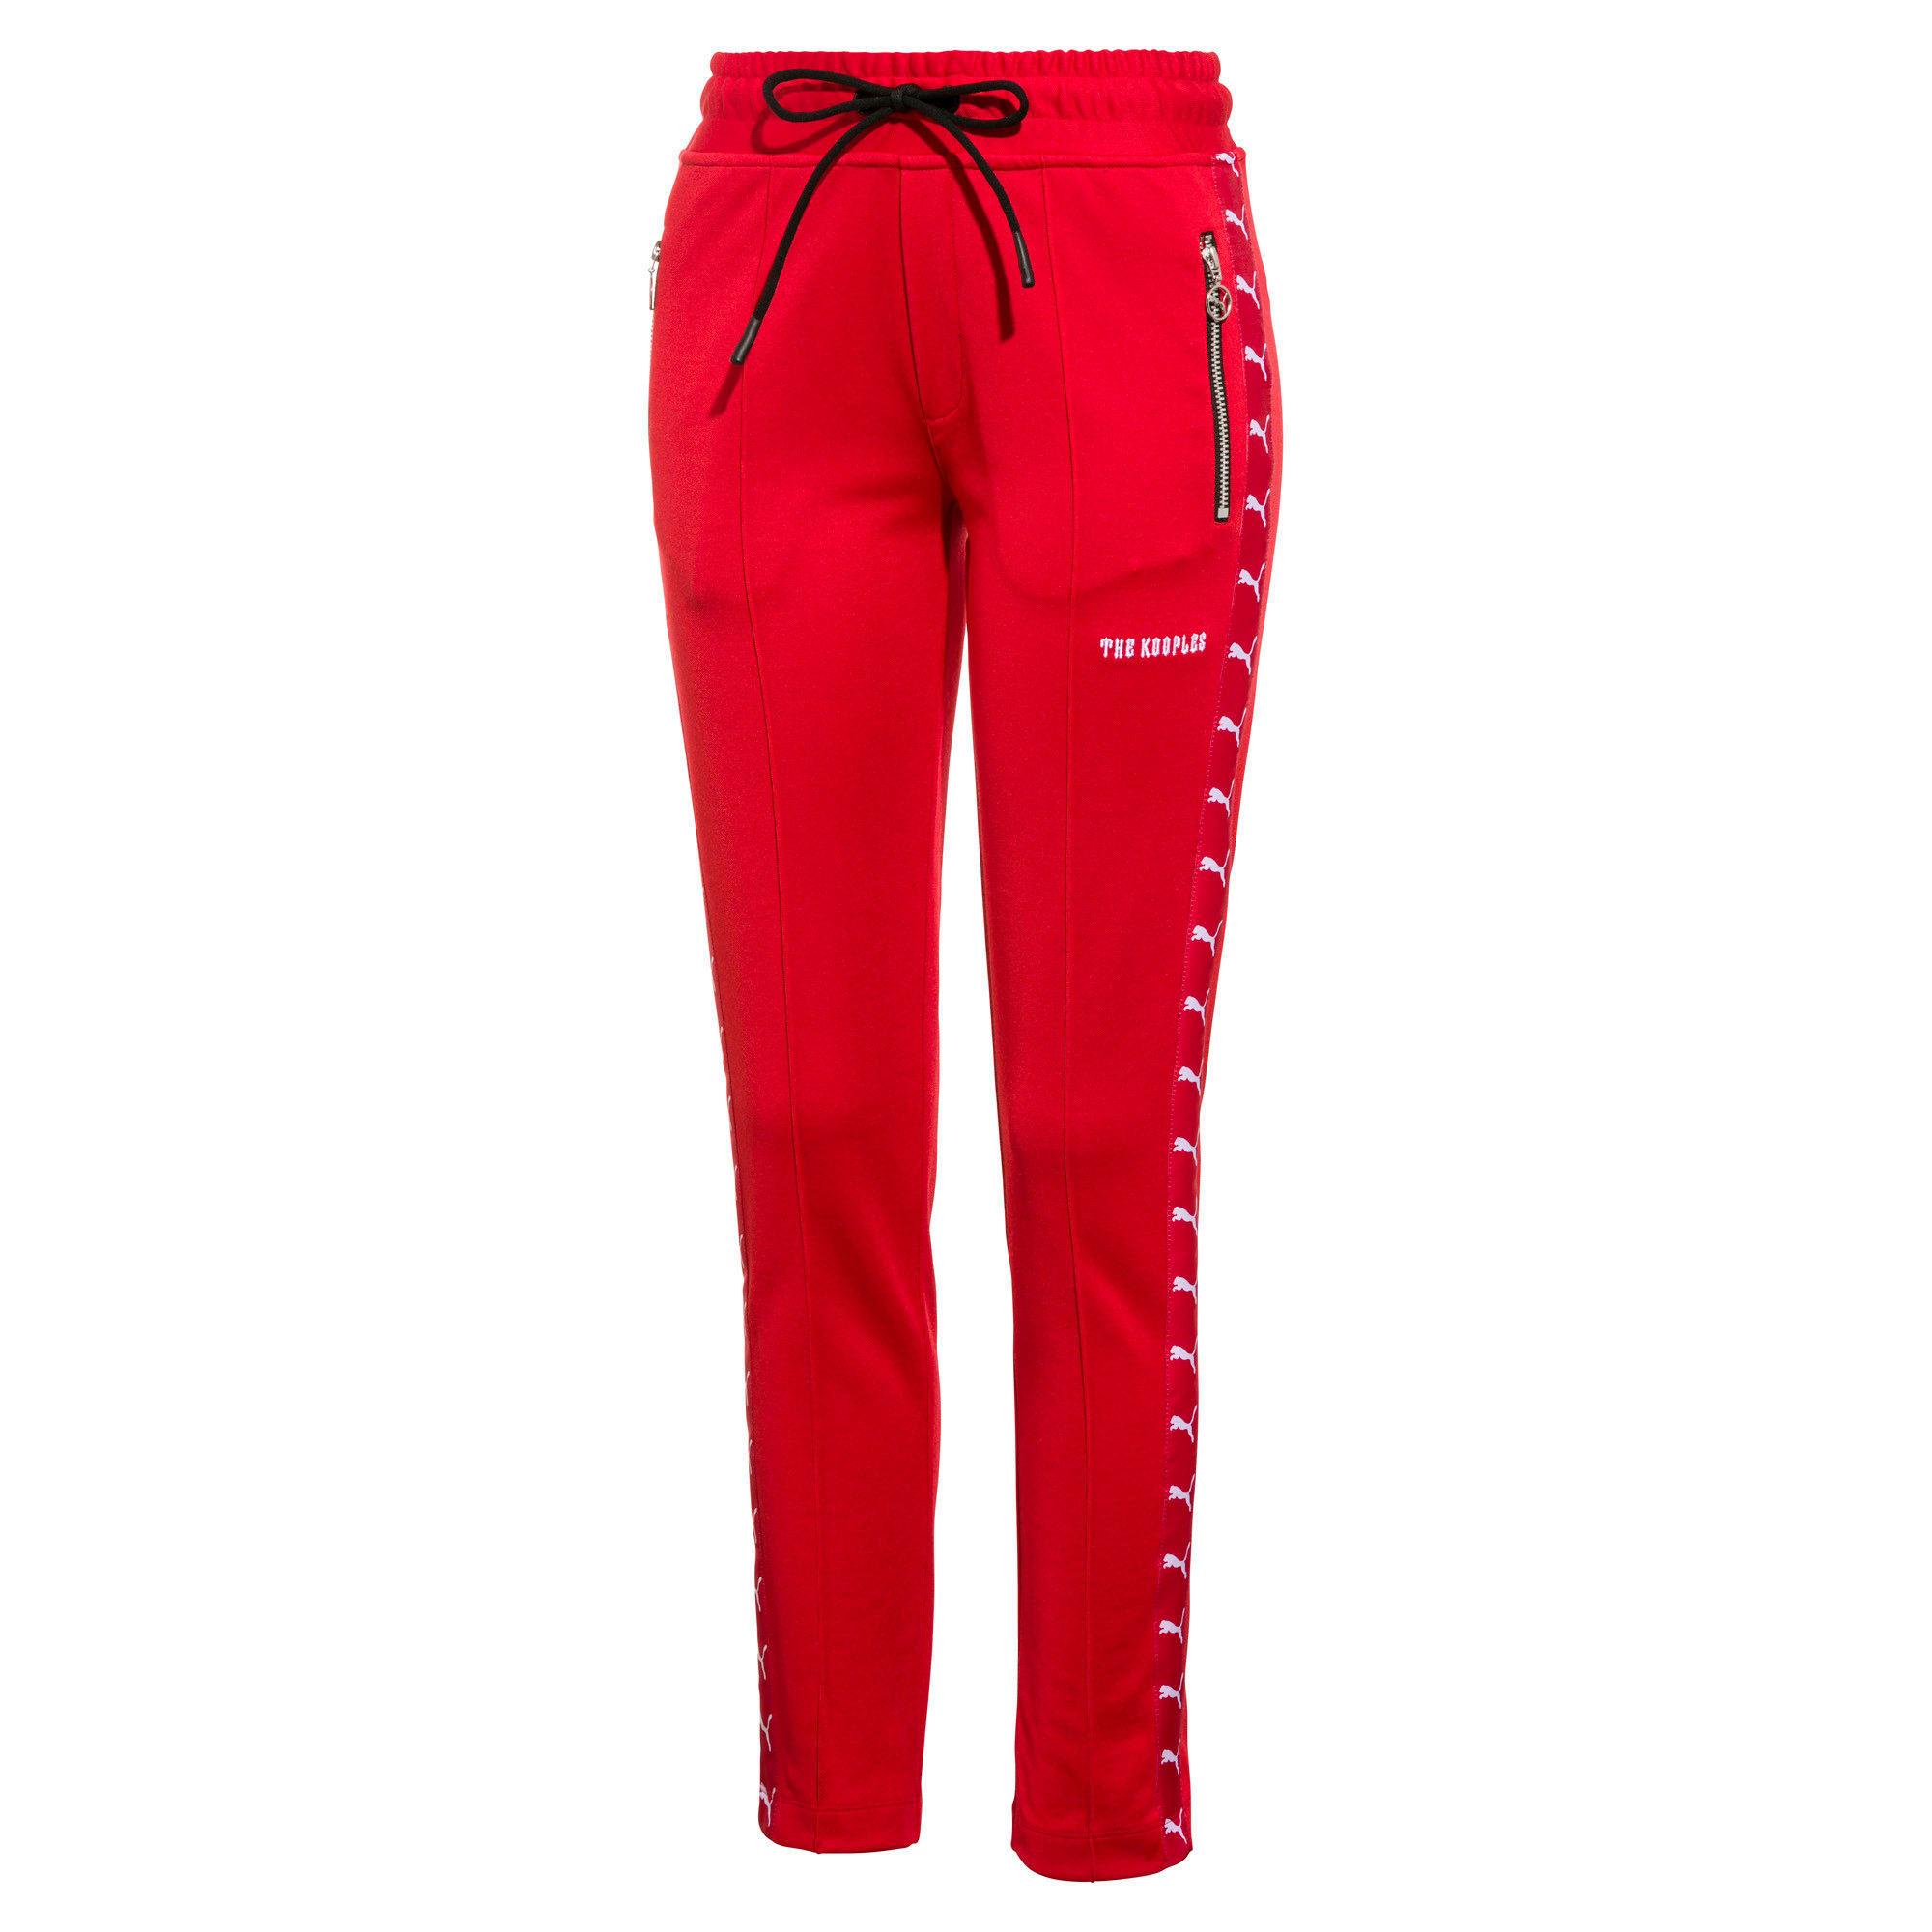 Thumbnail 1 of PUMA x THE KOOPLES Women's Track Pants, High Risk Red, medium